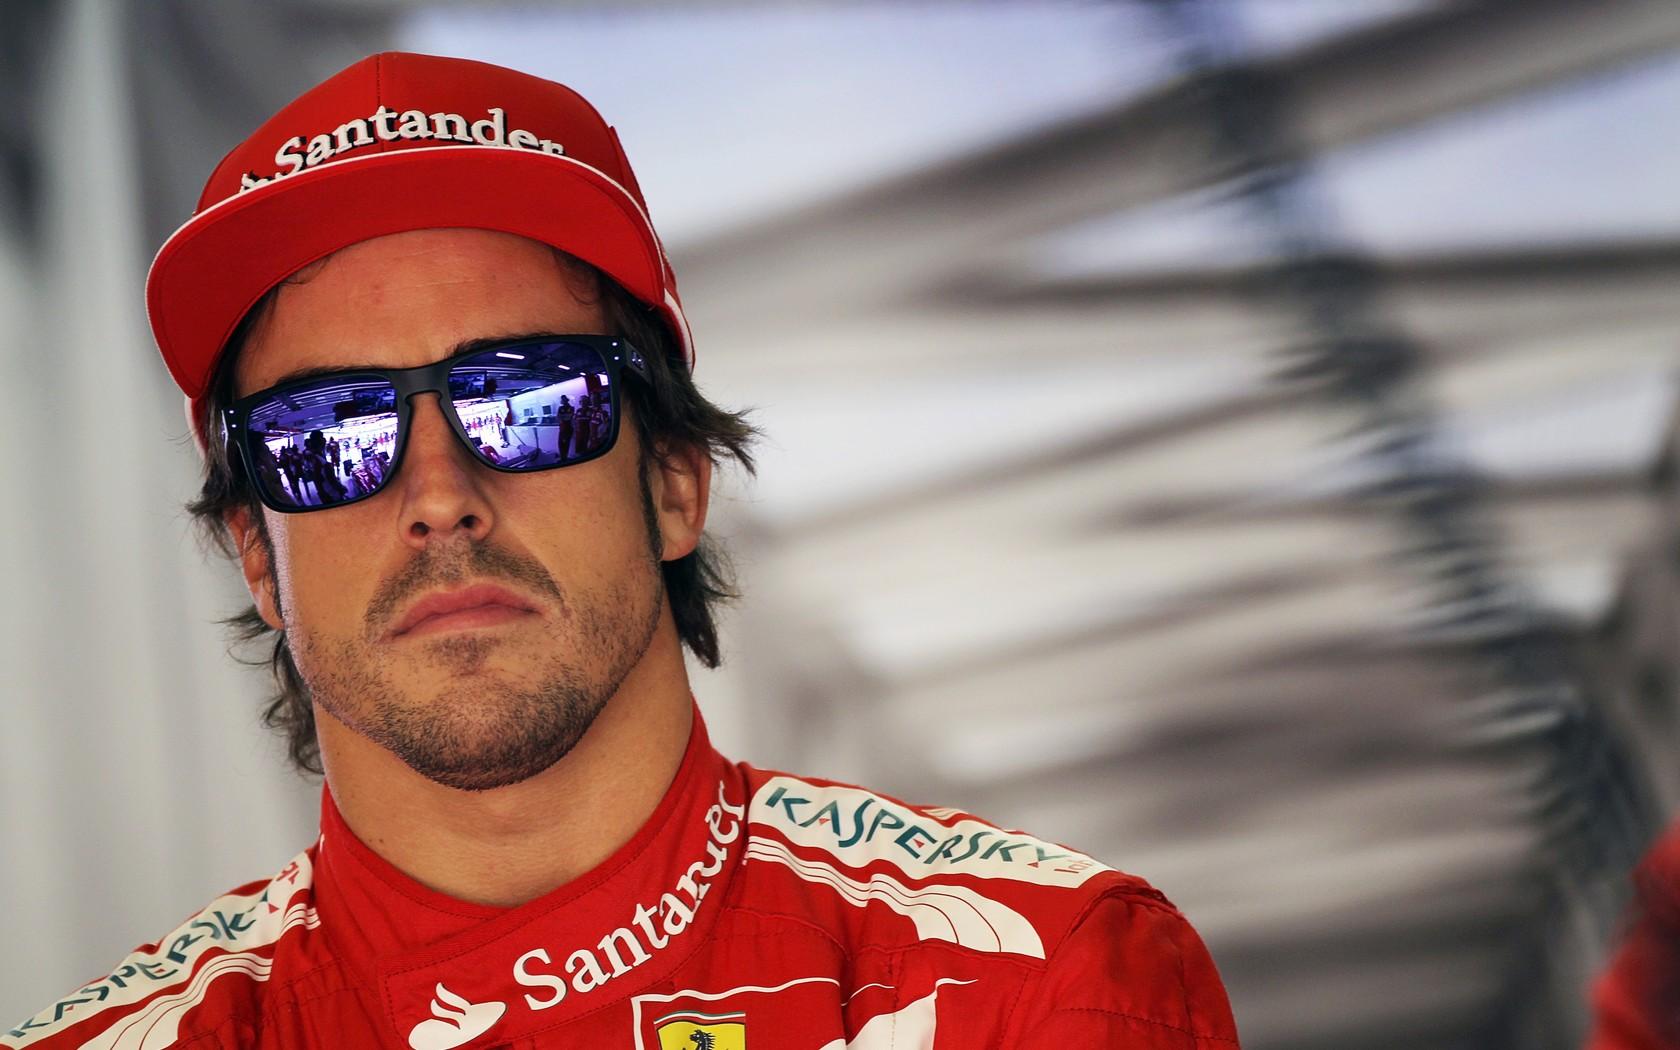 Fernando Alonso Backgrounds, Compatible - PC, Mobile, Gadgets| 1680x1050 px